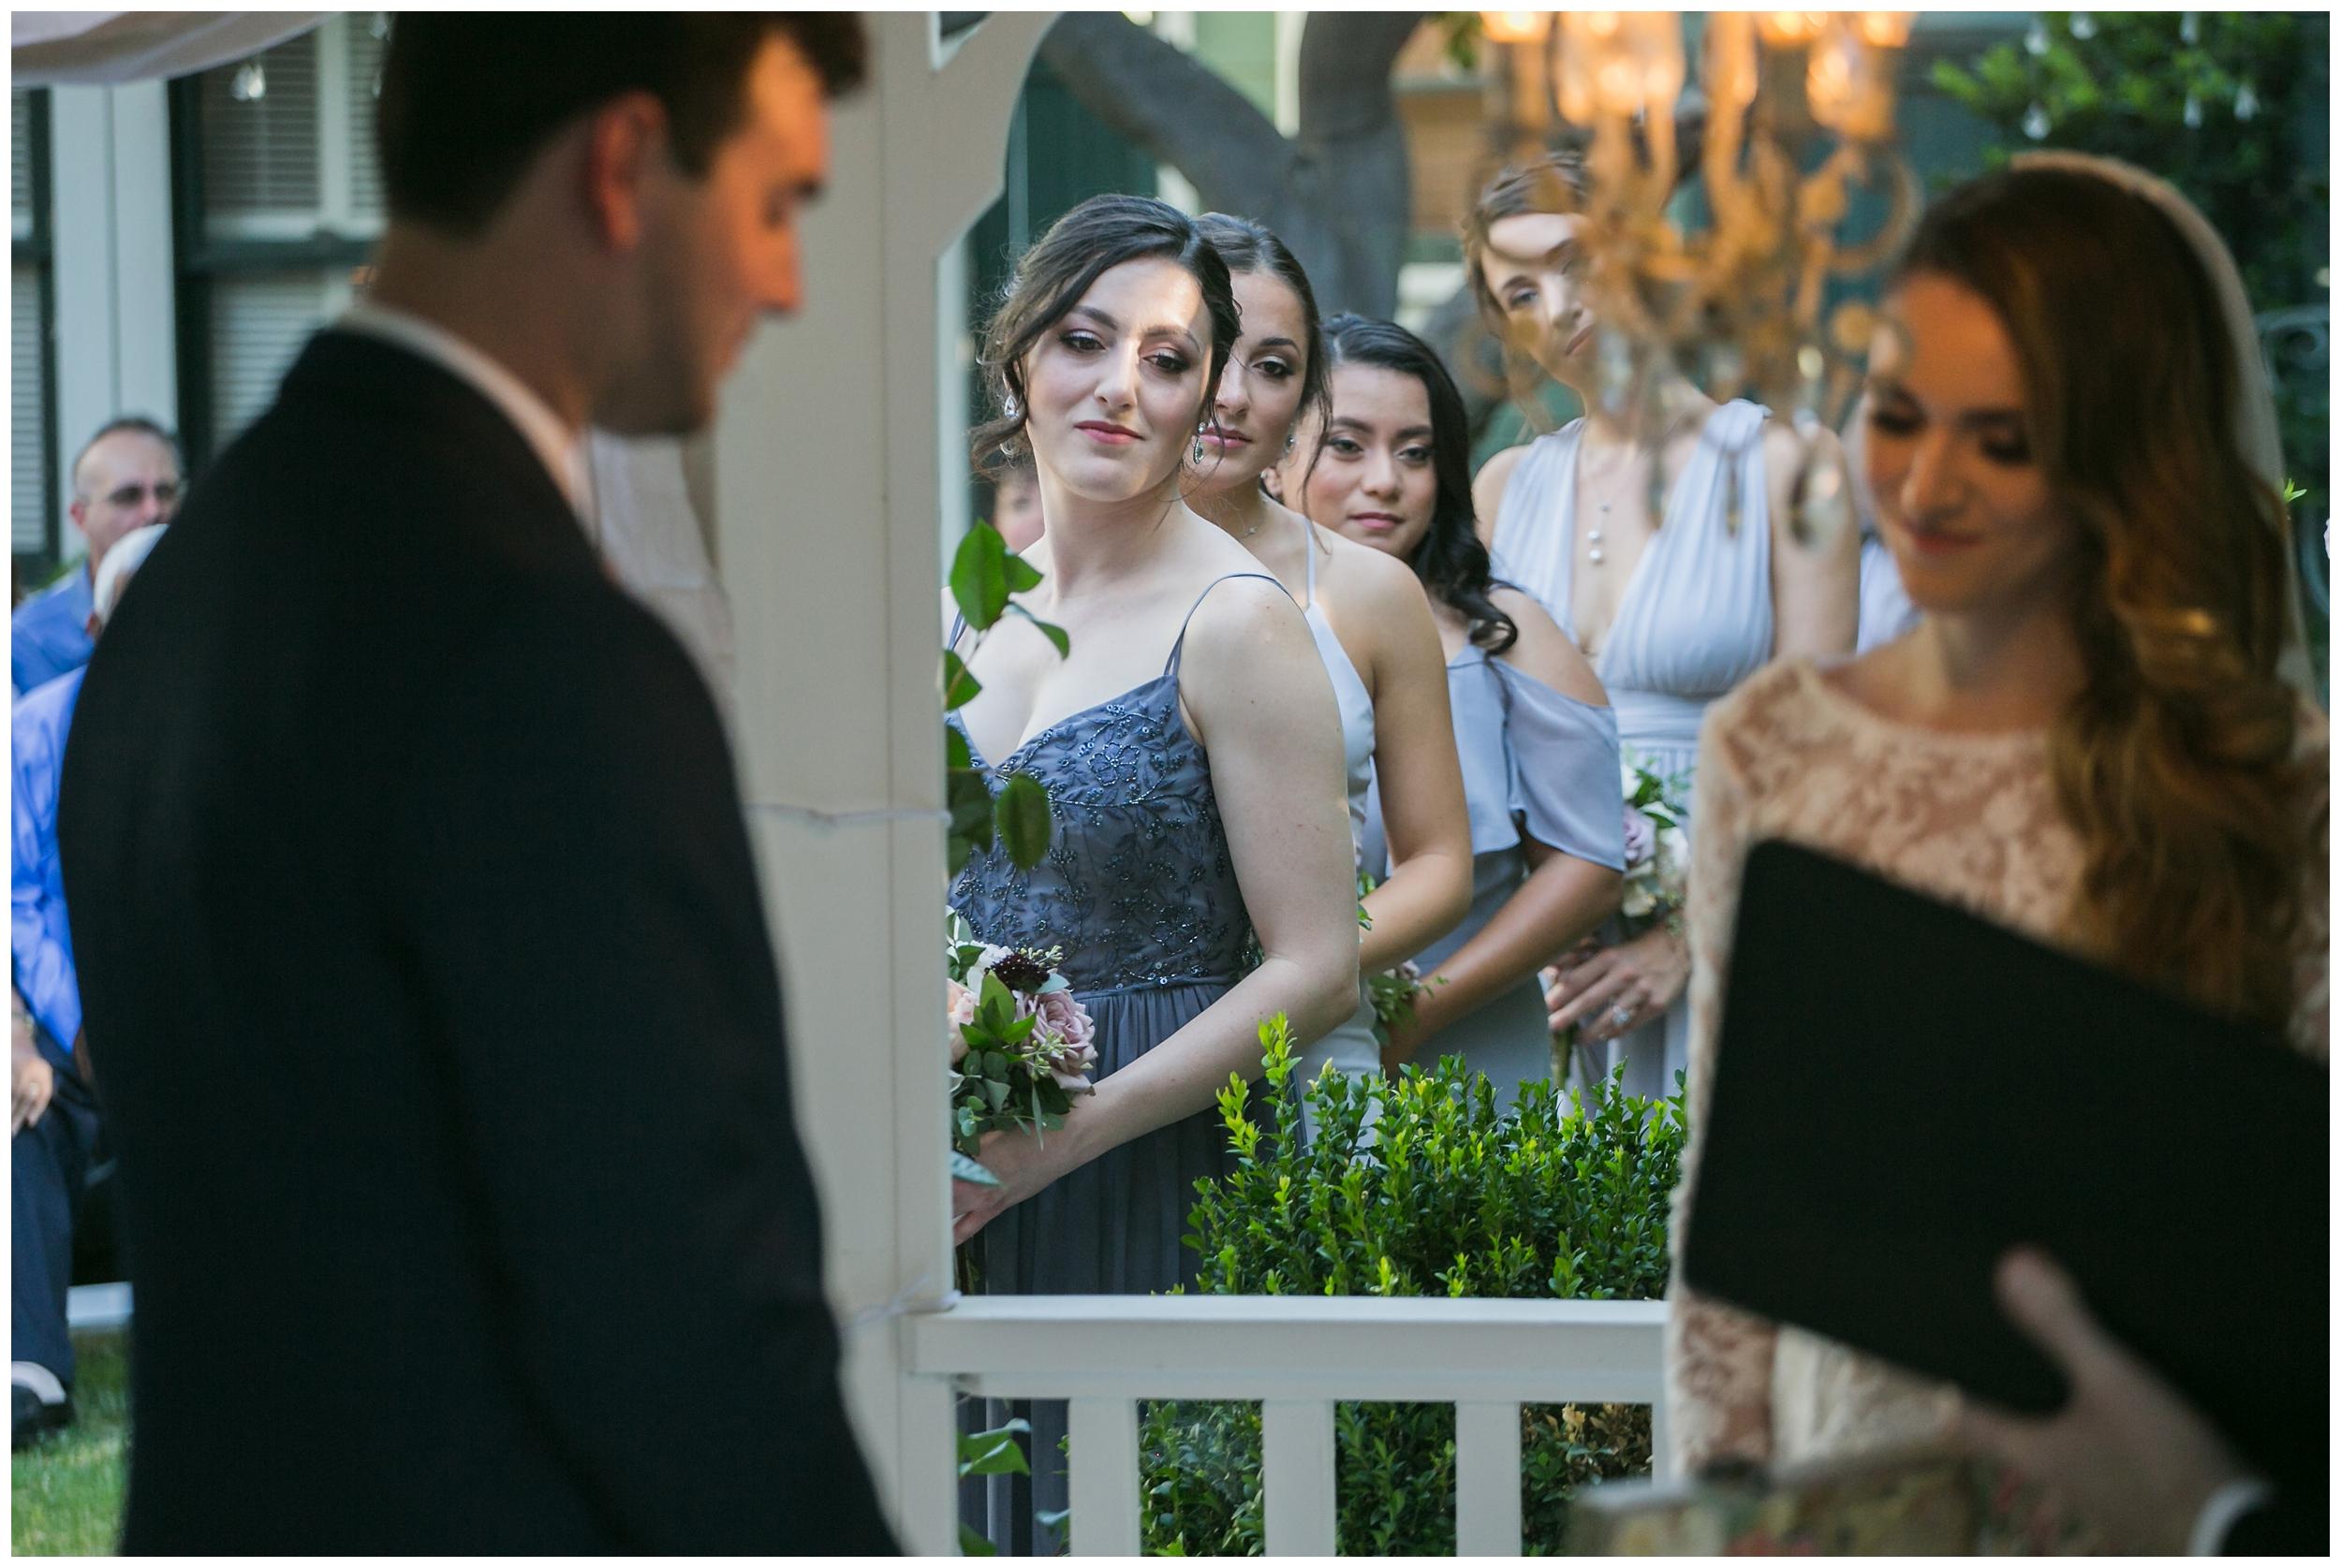 chic-christmas-house-wedding-ceremony-carrie-vines-010.jpg